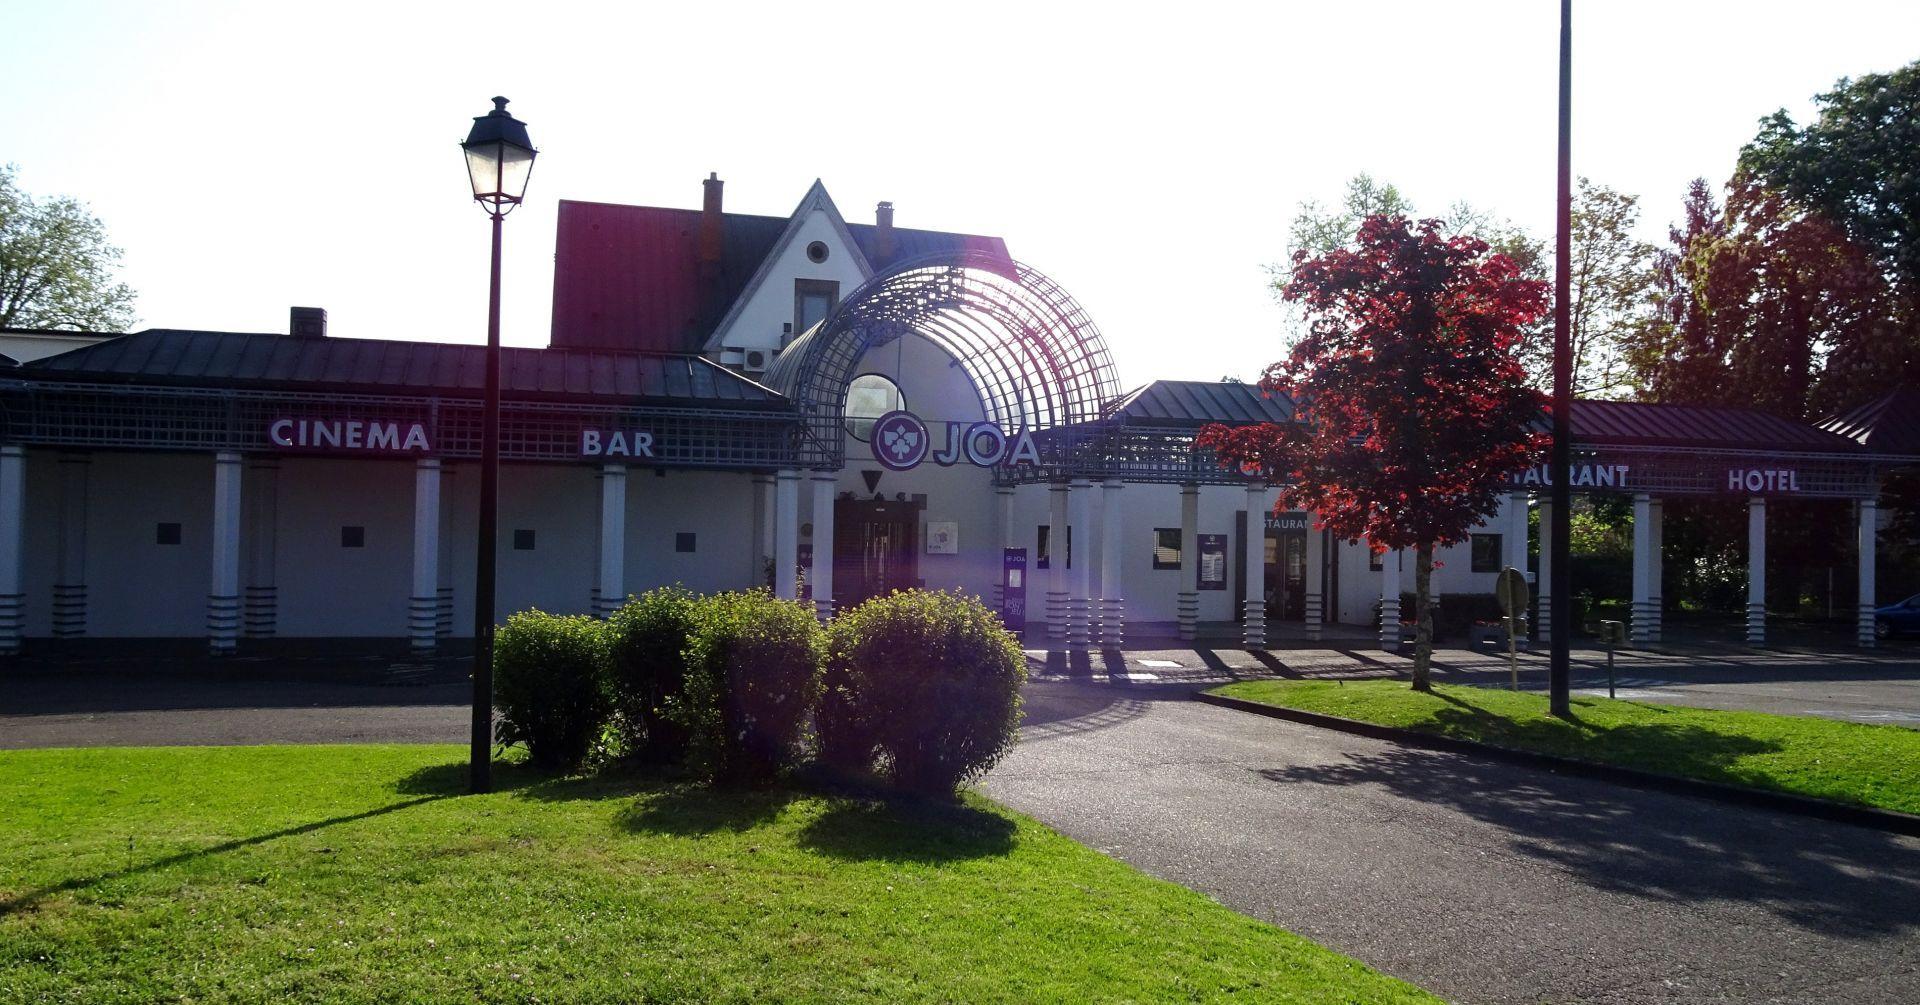 Casino de Luxeuil : avis et informations complémentaires